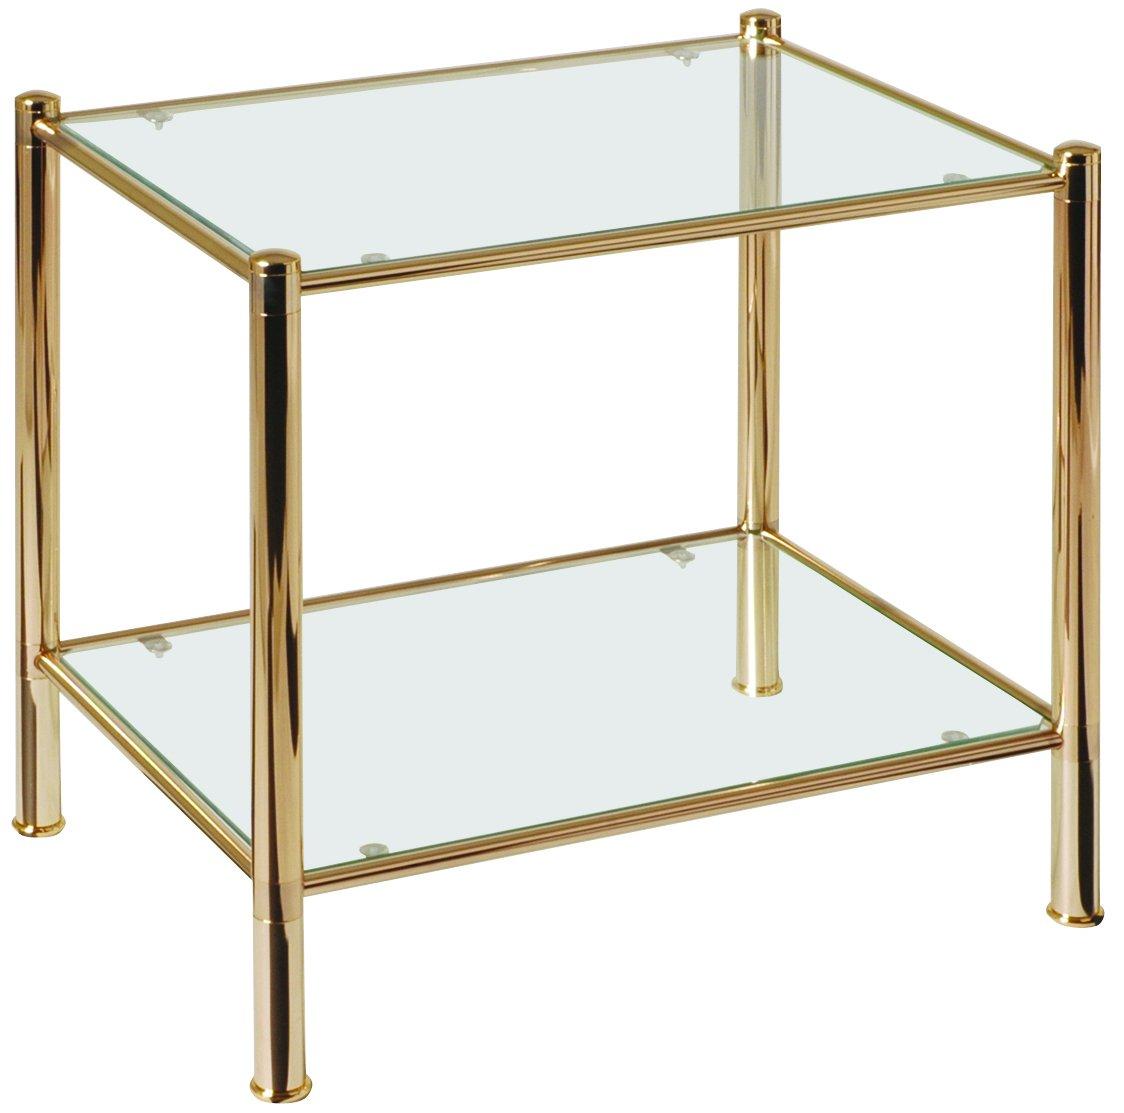 HAKU Furniture 87309 End Table, 50 x 54 x 41 cm